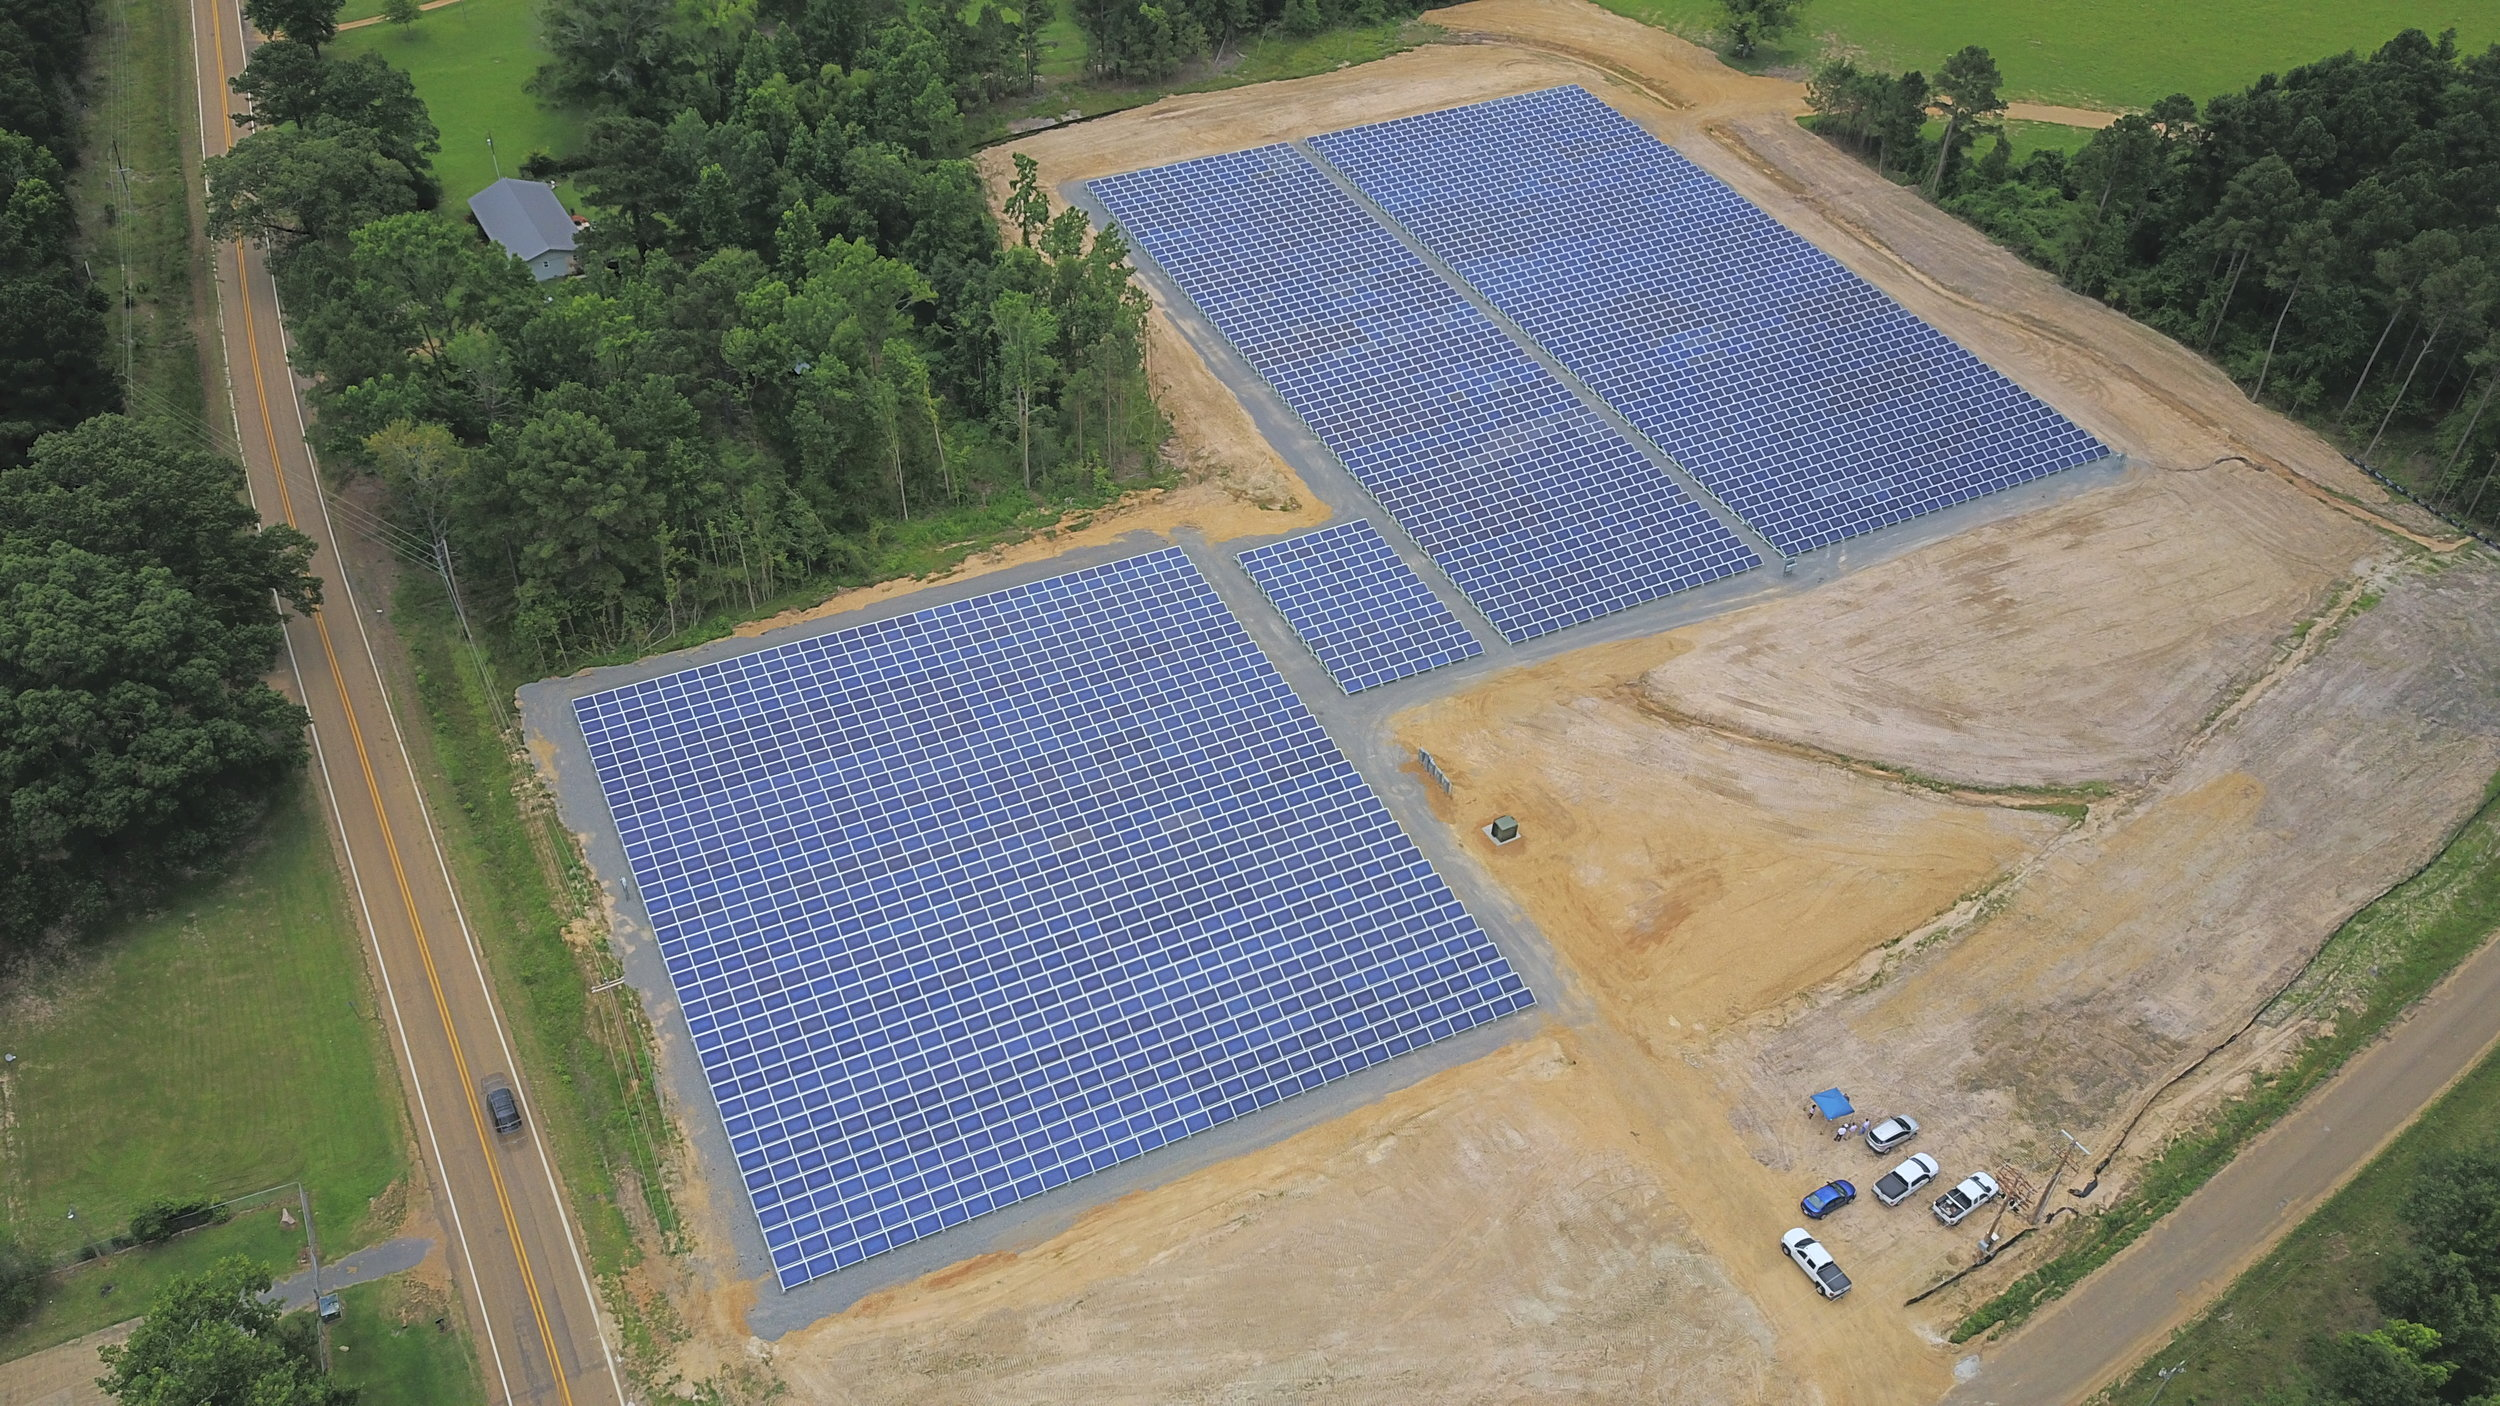 Ouachita Electric Cooperative (OECC) - 1 MW Grount Mount System - HOLLY SPRINGS, ARKANSAS